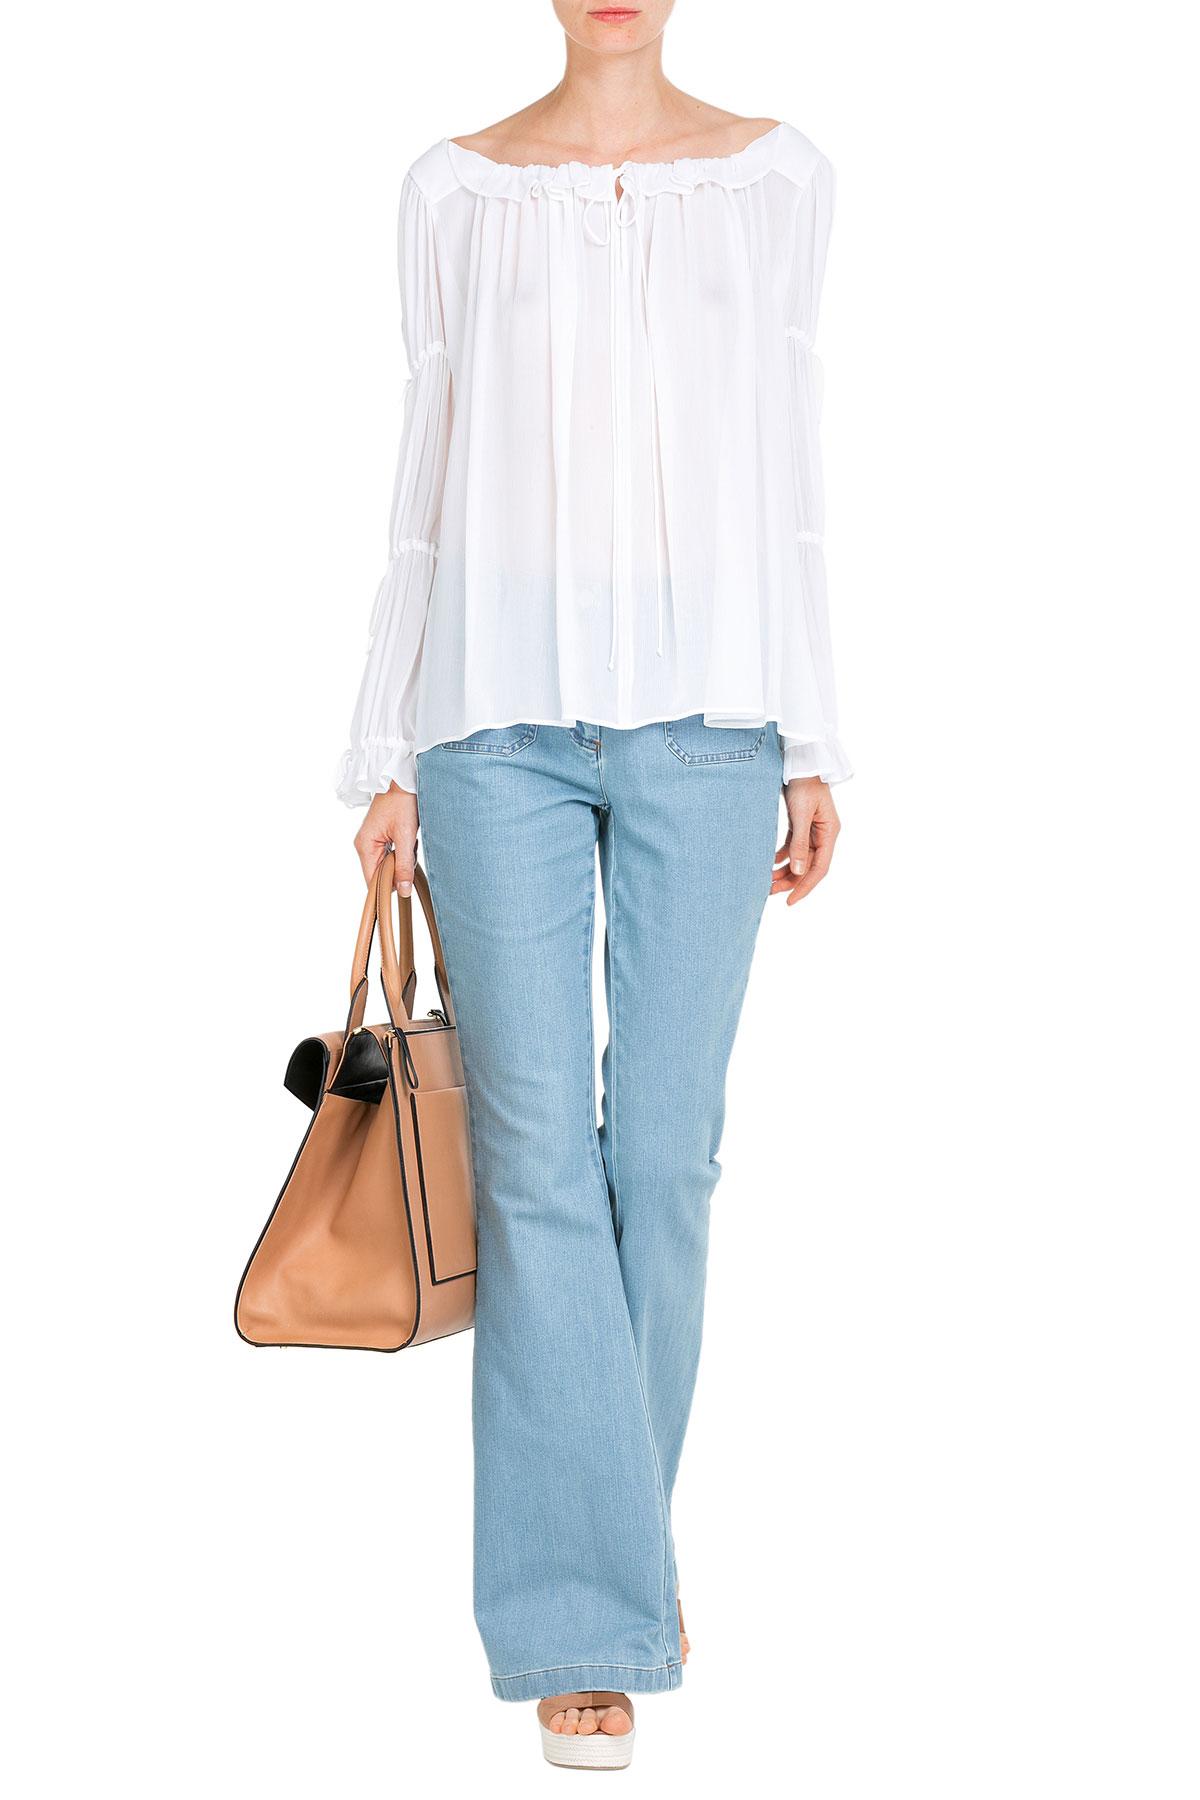 Michael Kors flared jeans Michale Kors crepe peasant blouse